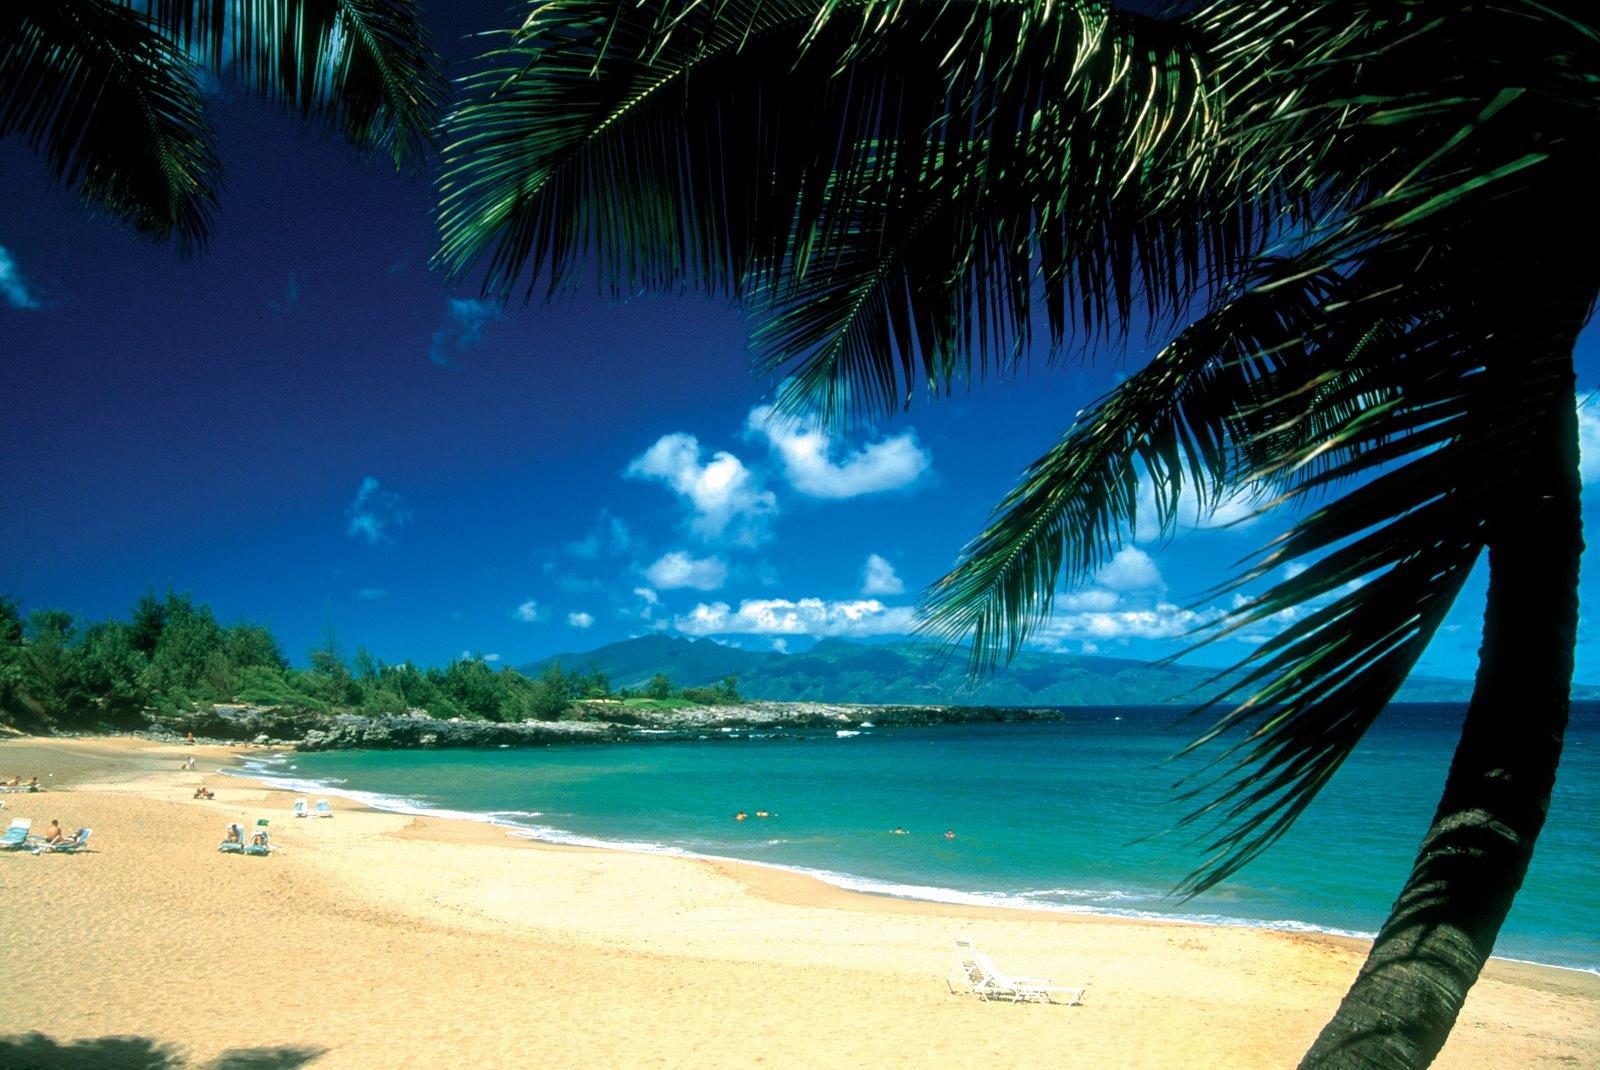 Package deals nz to hawaii